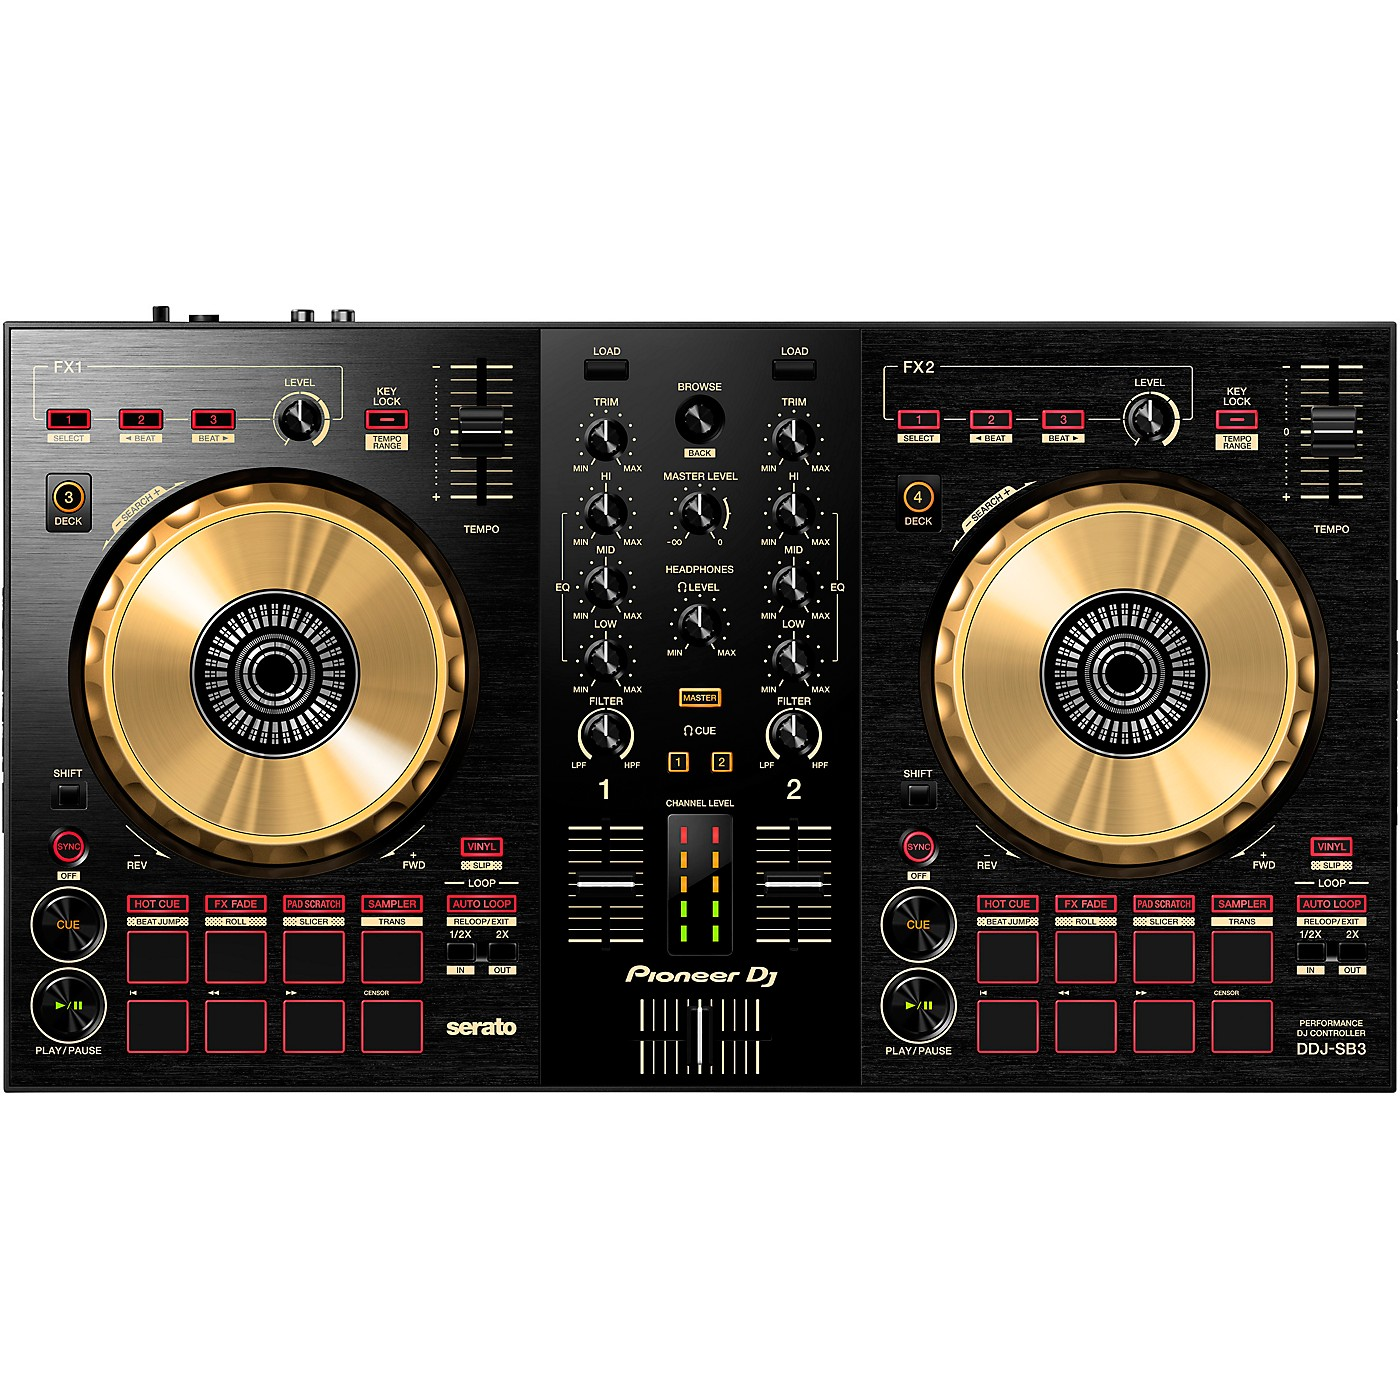 Pioneer DJ DDJ-SB3-N Limited Edition Gold Serato DJ Controller With Pad Scratch thumbnail